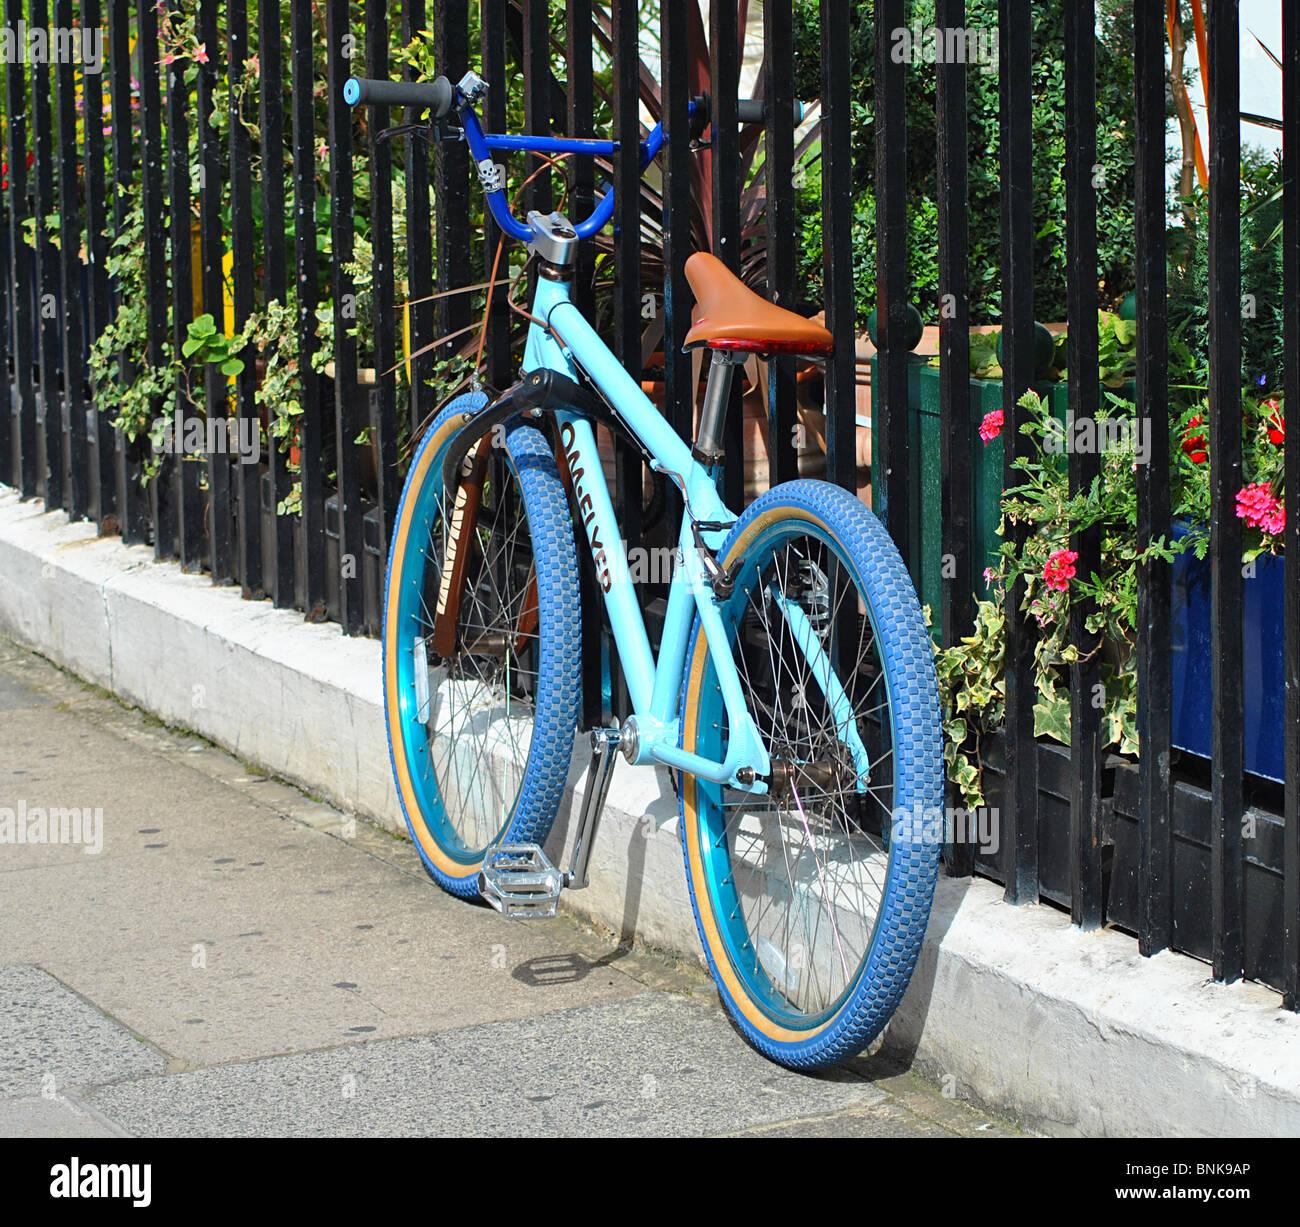 Blue bike, London - Stock Image